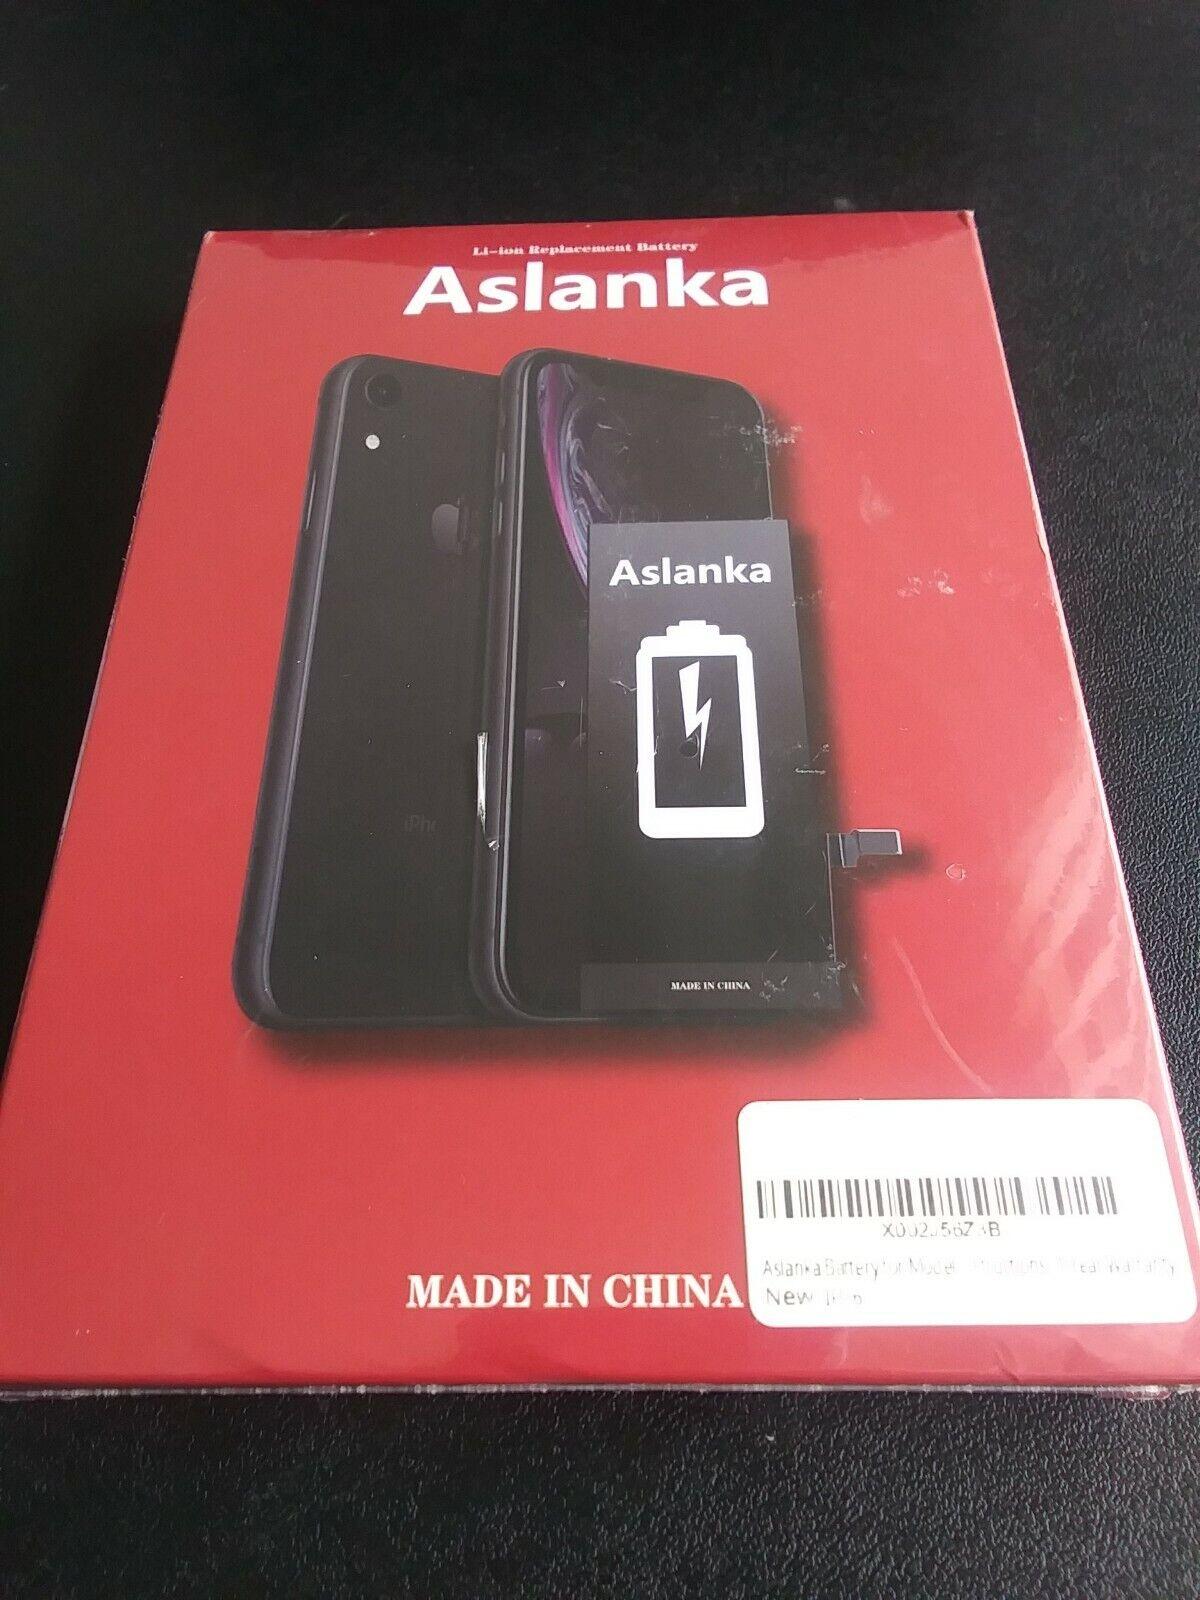 ASLANKA Li-ion Replacment Battery for I-PHONE 6 - 1 Year Warranty / NEW Sealed